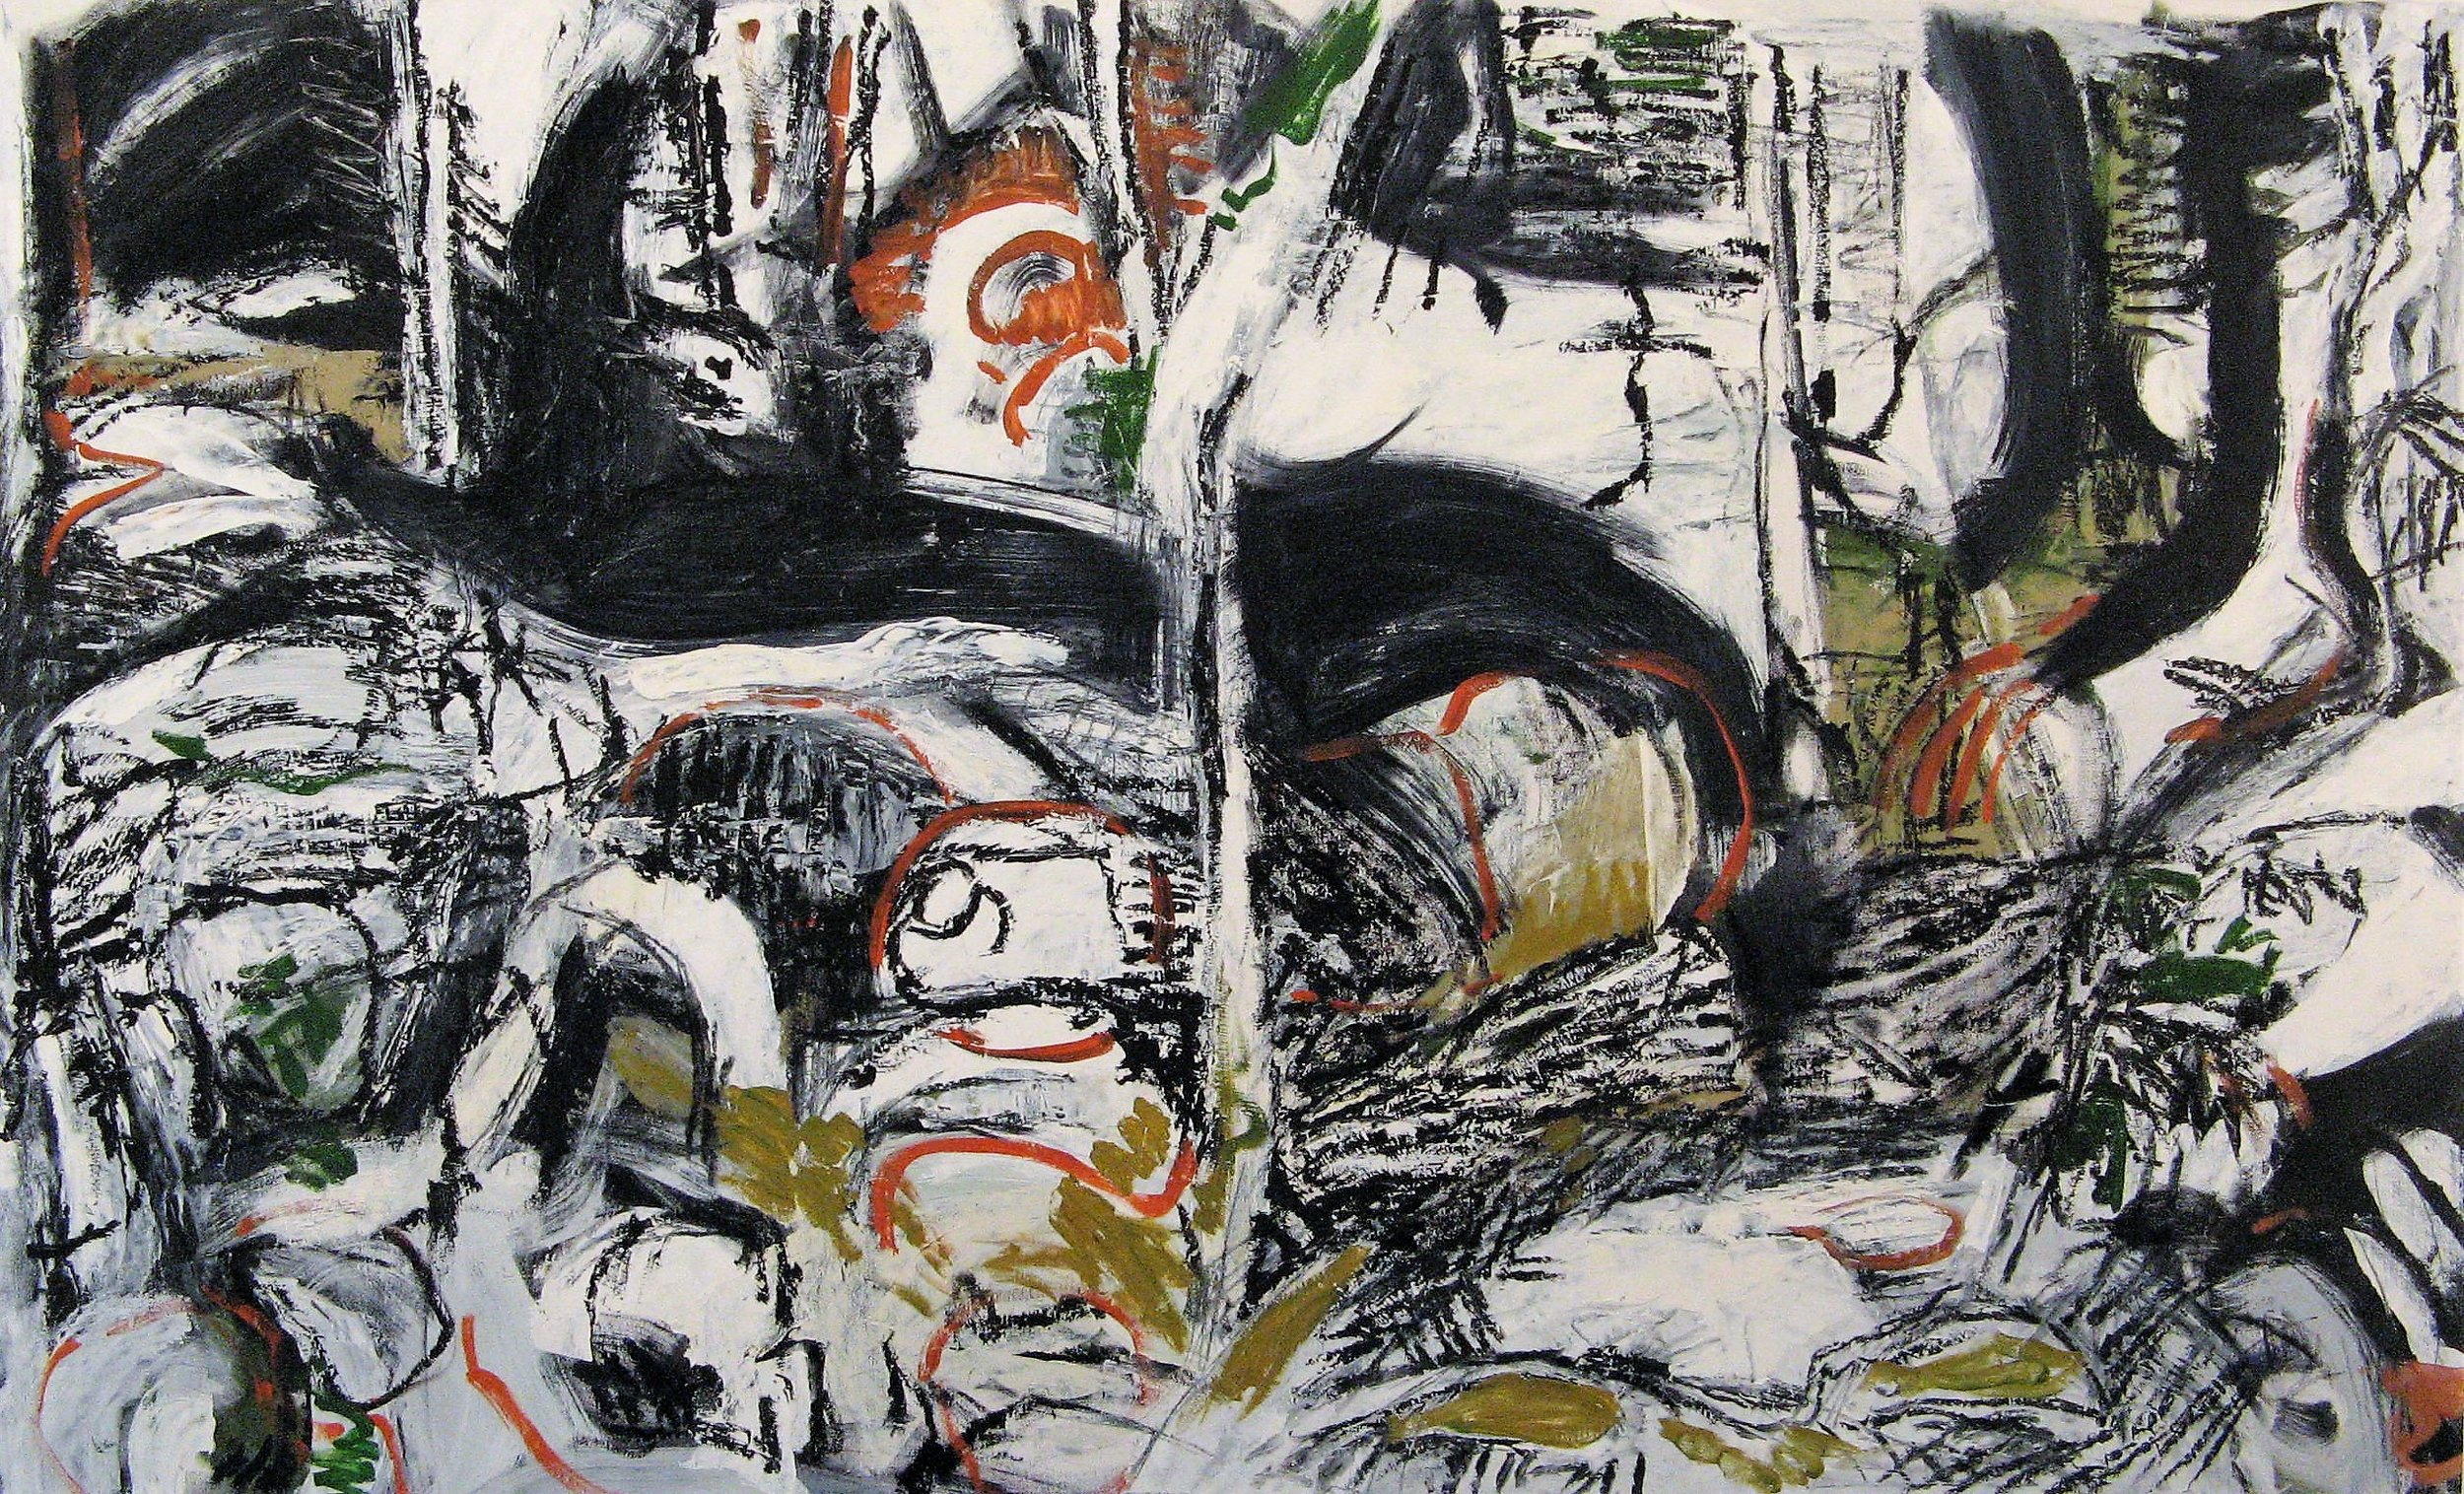 Iris Osterman: Sticks and stones